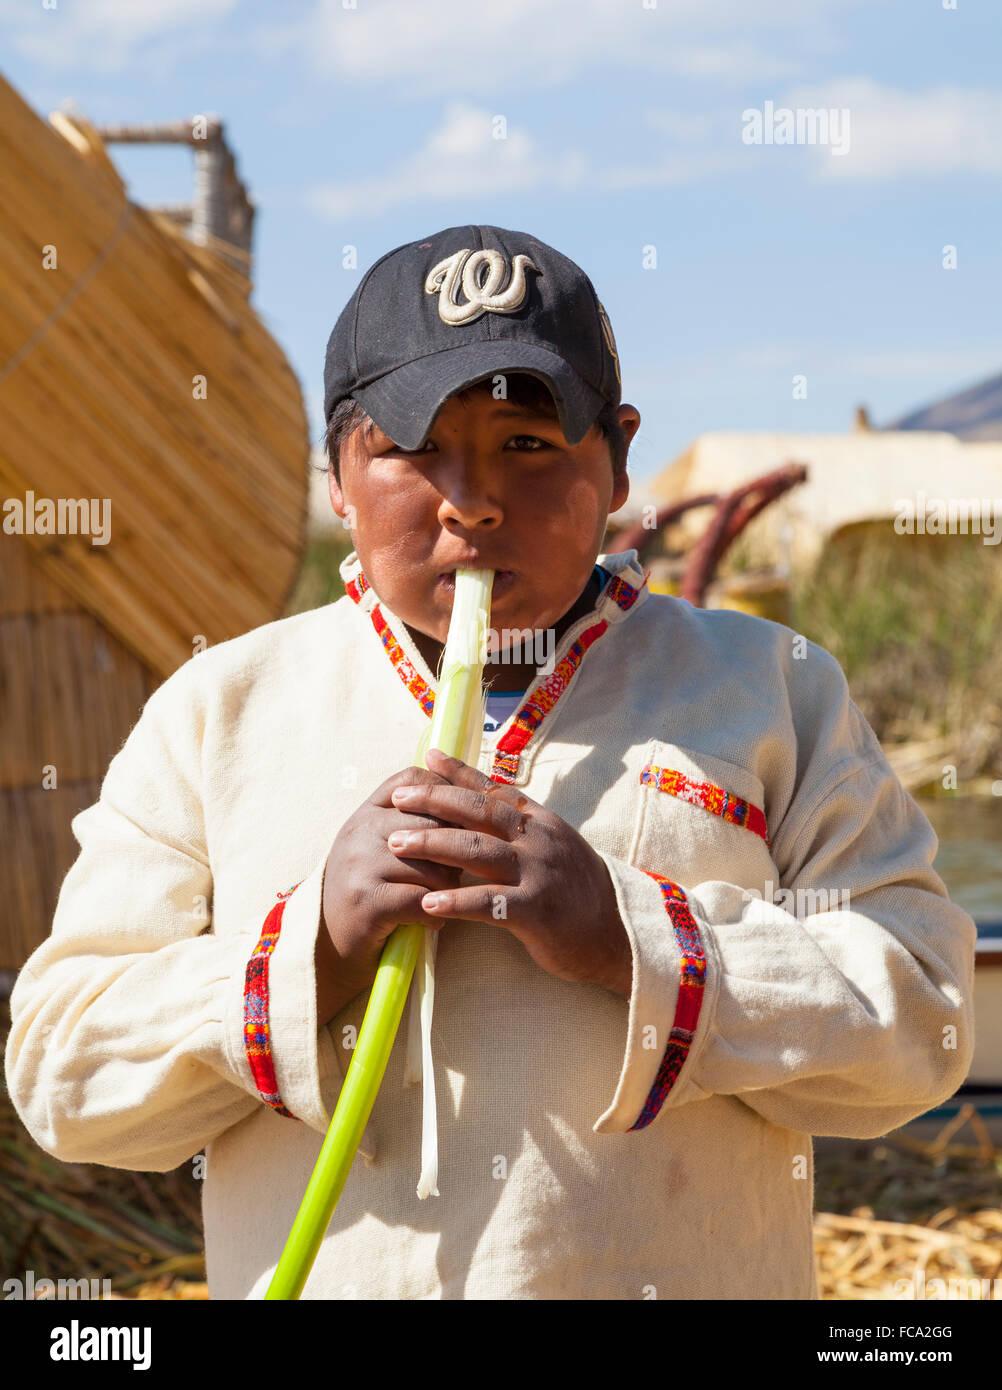 Uros Indian Boy, Uros floating Islands, Peru - Stock Image